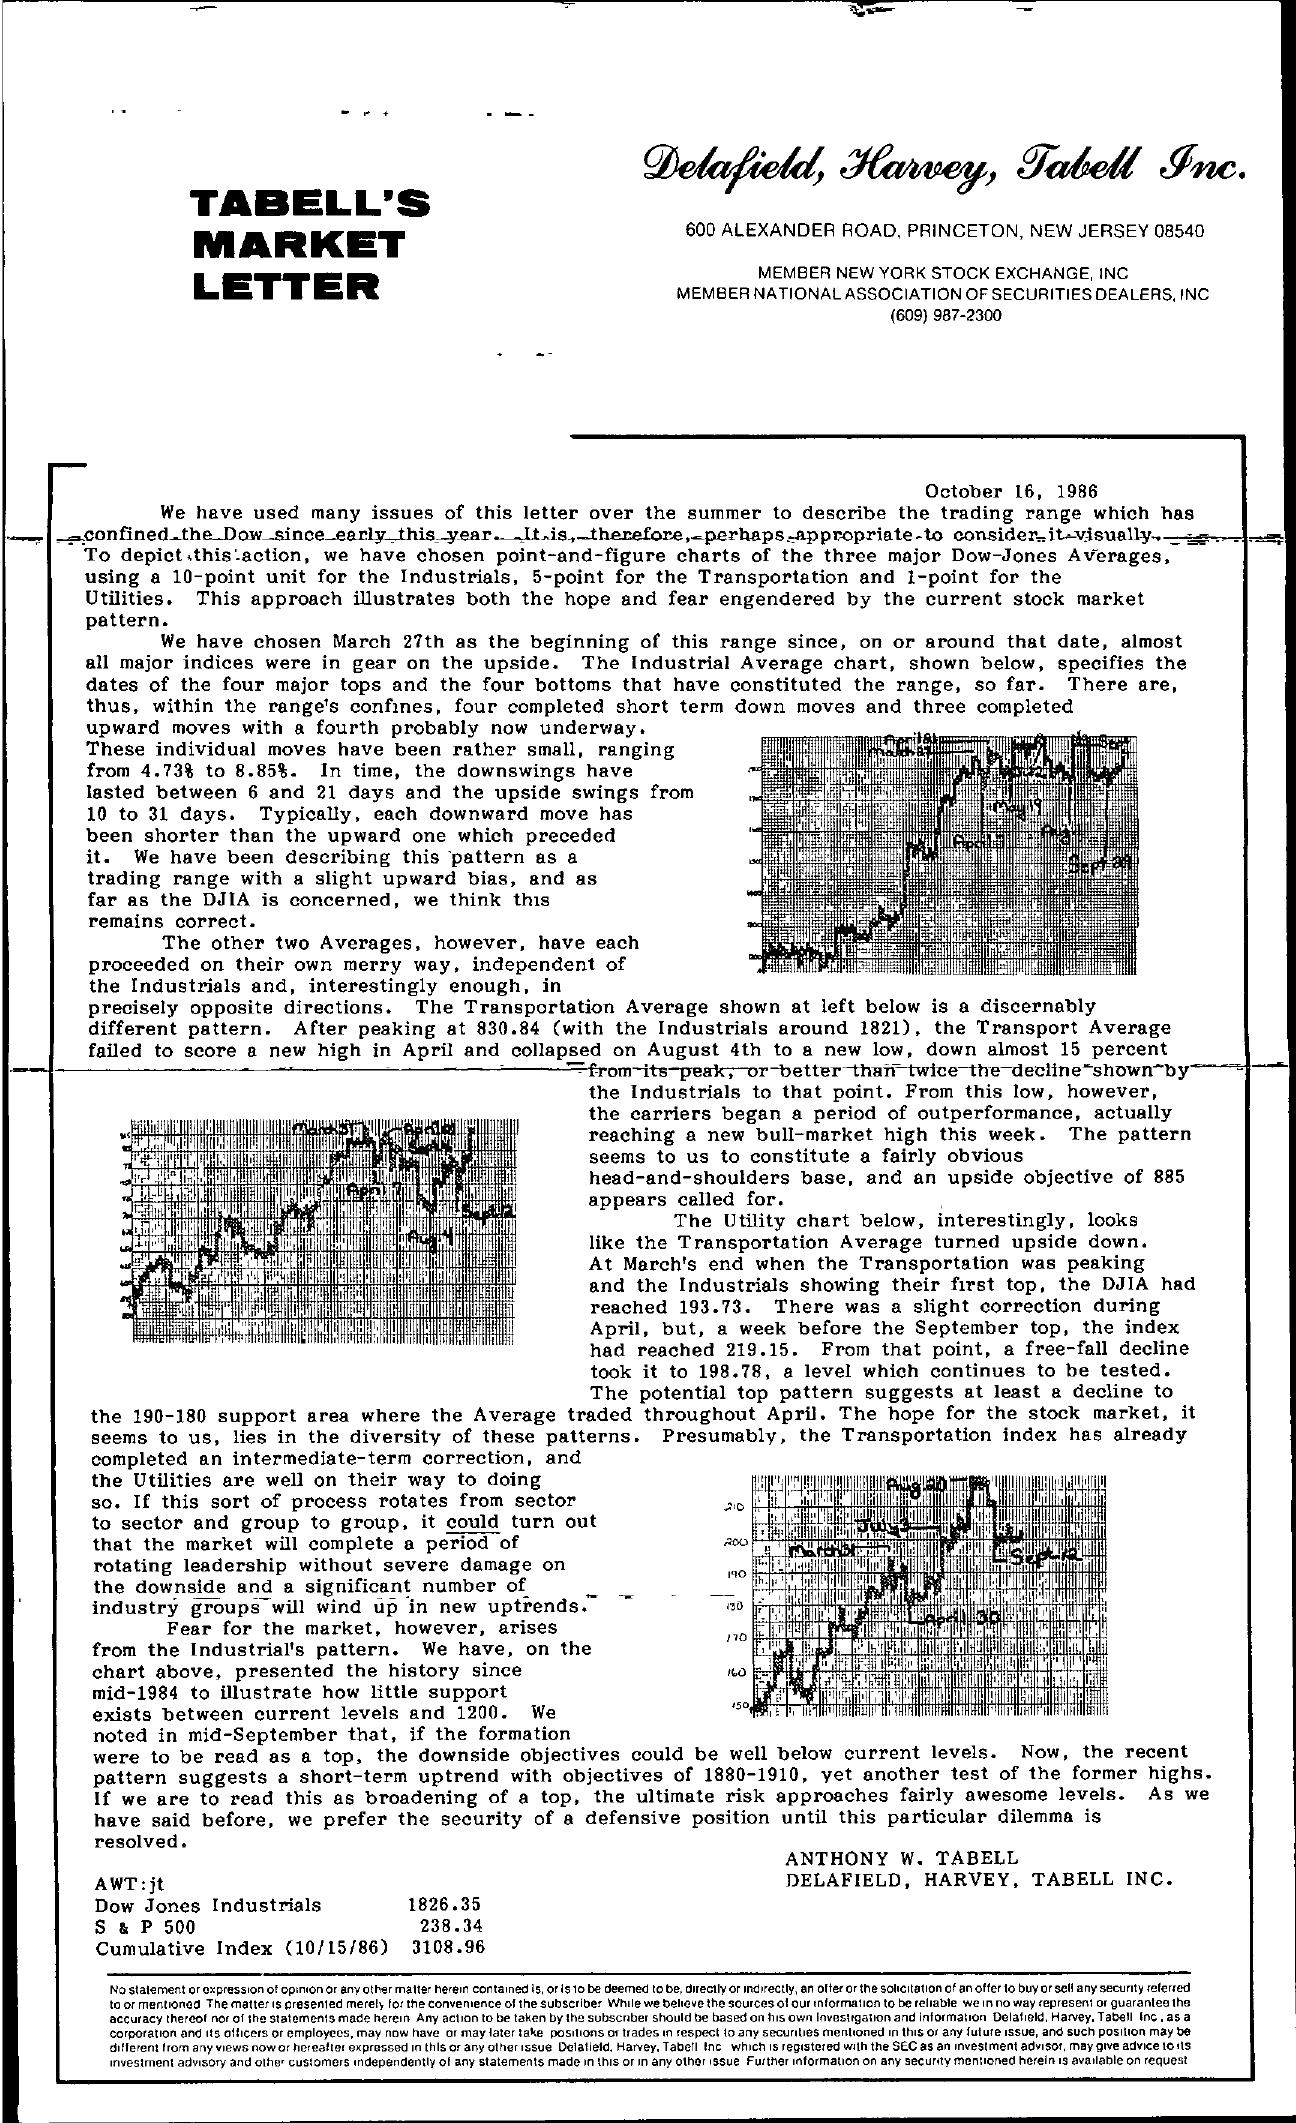 Tabell's Market Letter - October 16, 1986